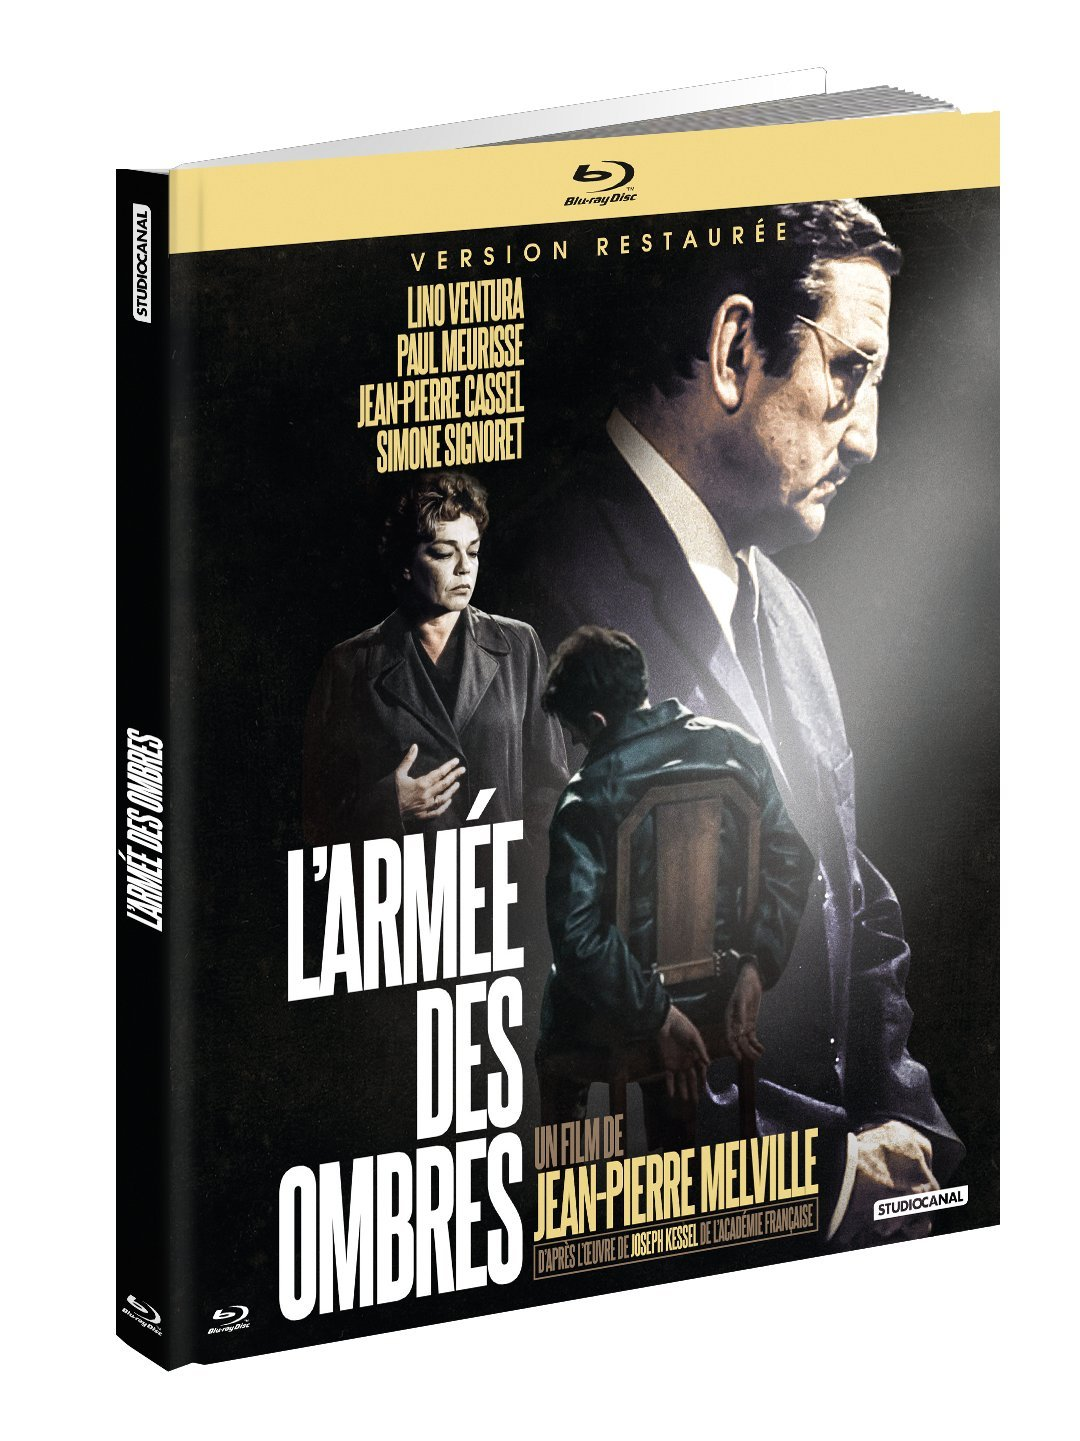 Jean Pierre Melville 71bPe21U9nL._SL1441_